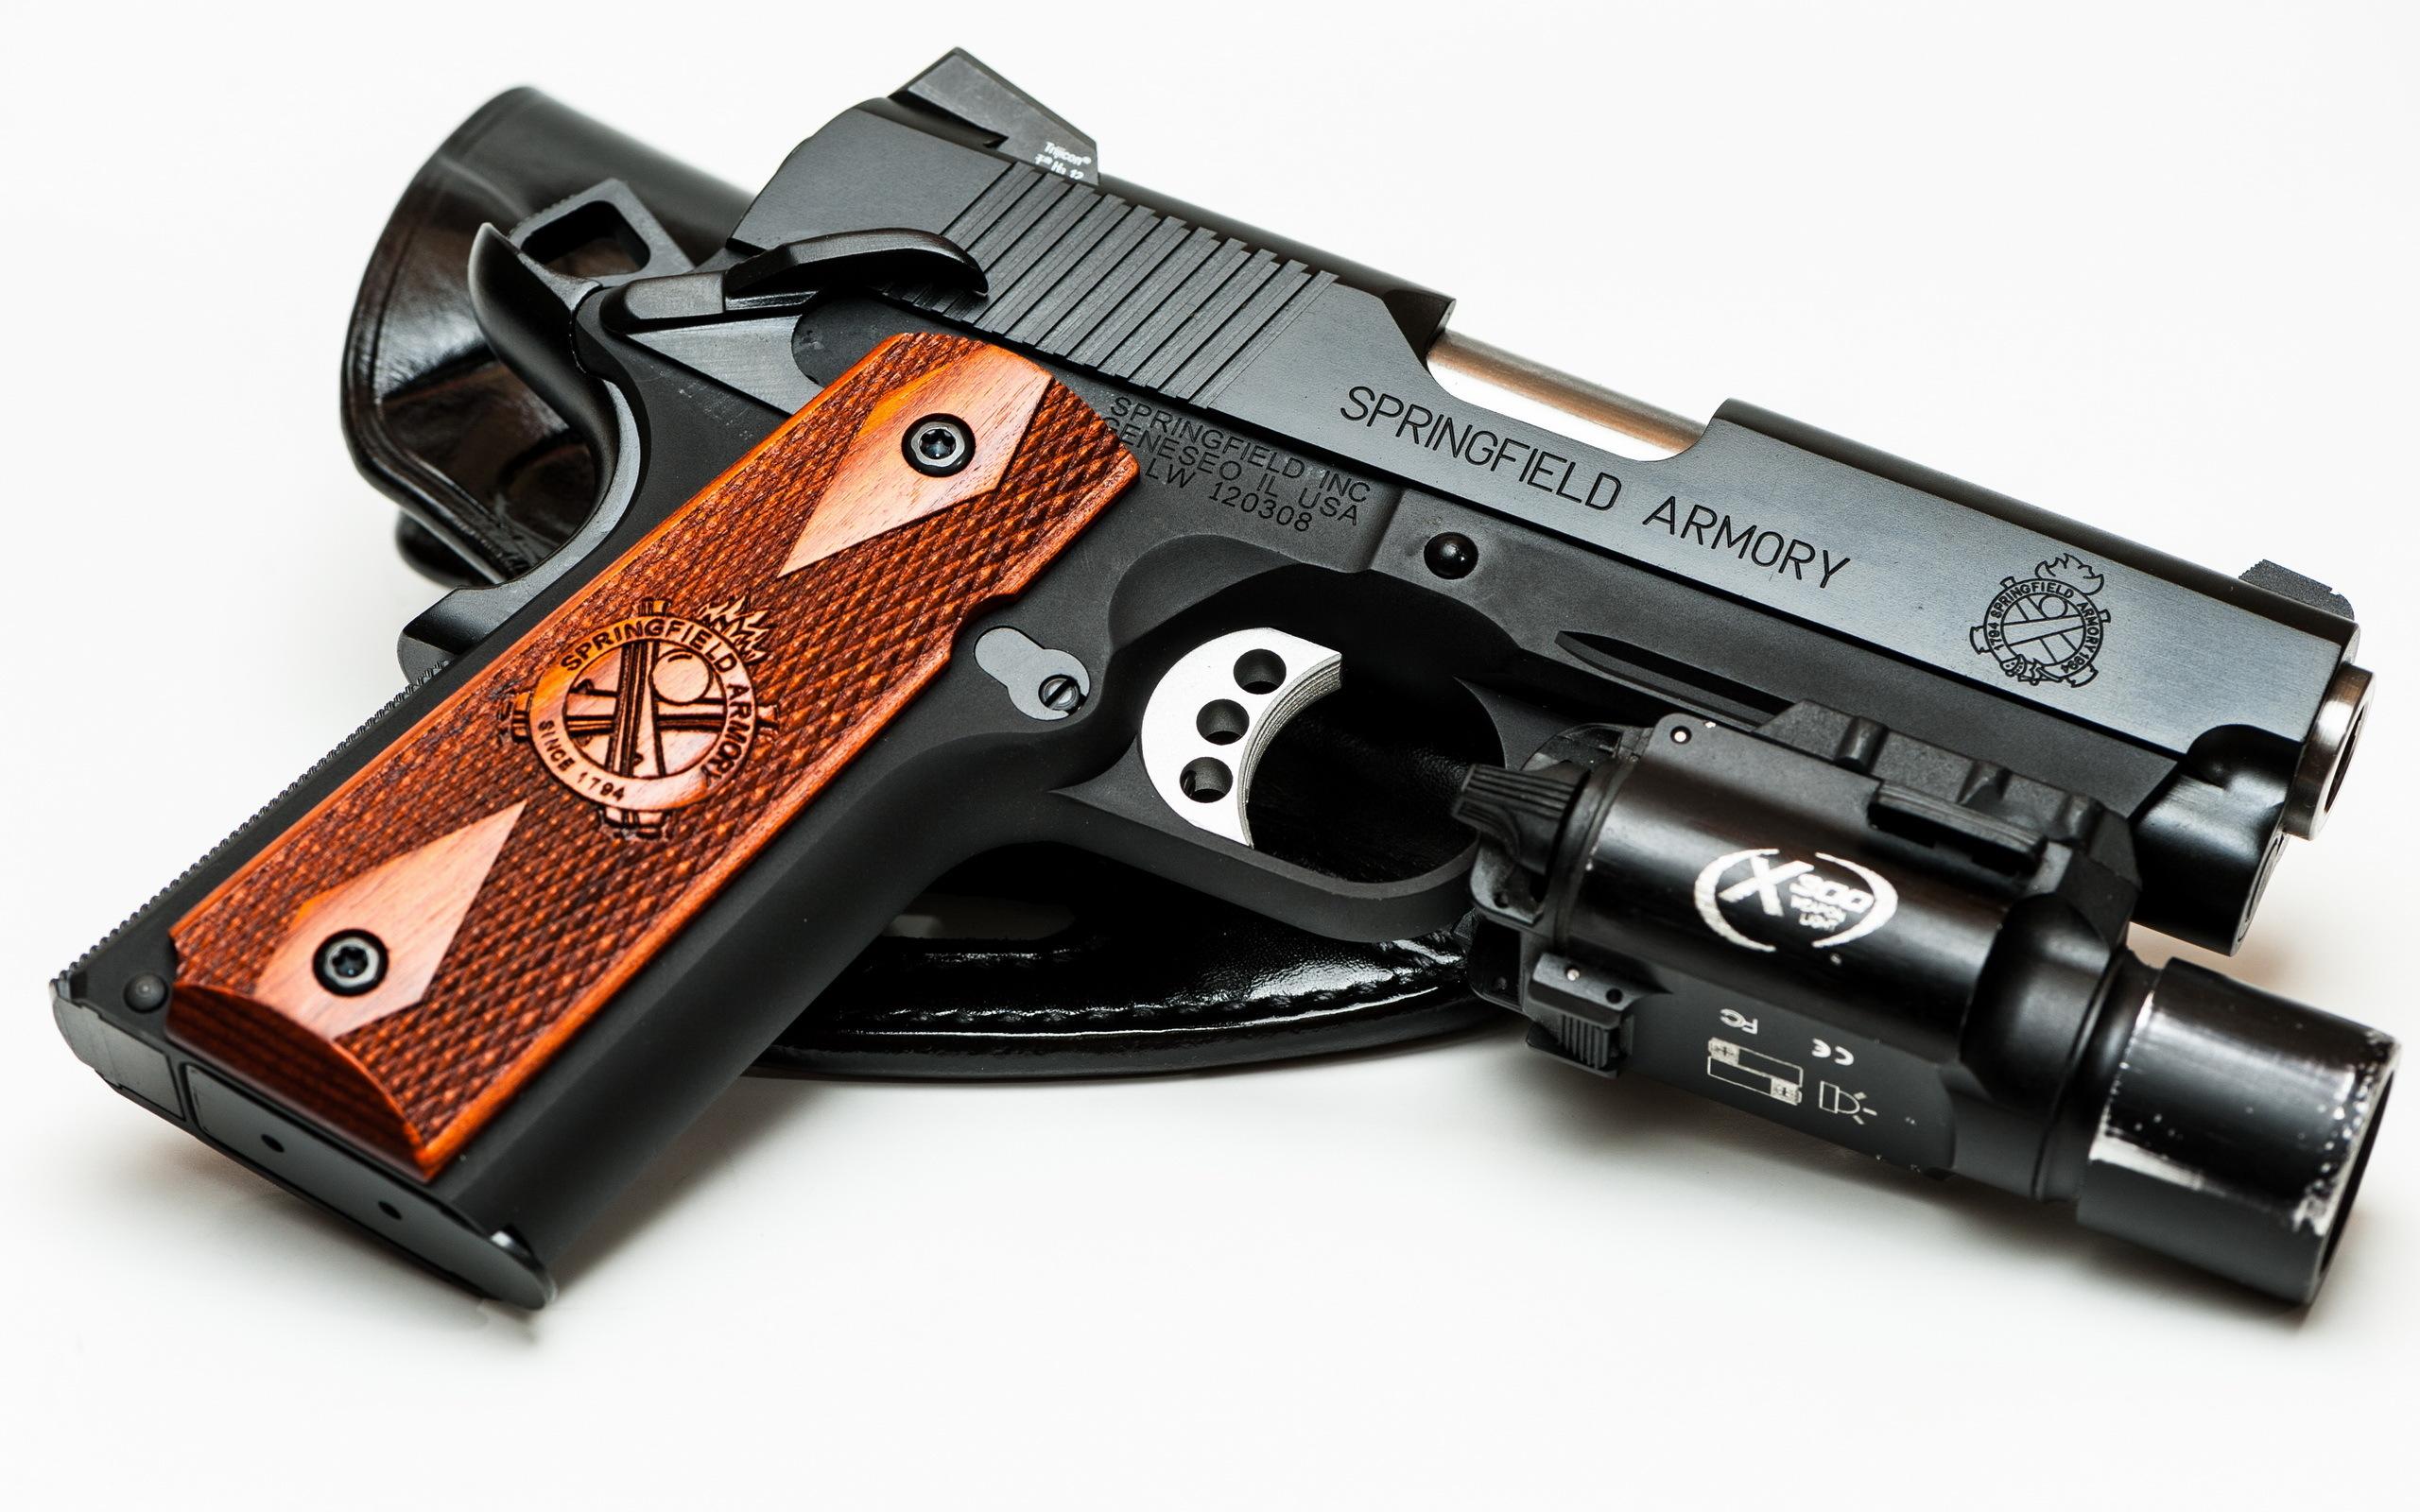 Springfield Armory 1911 Pistol Weapon Pistol Gun Handgun Wallpaper 2560x1600